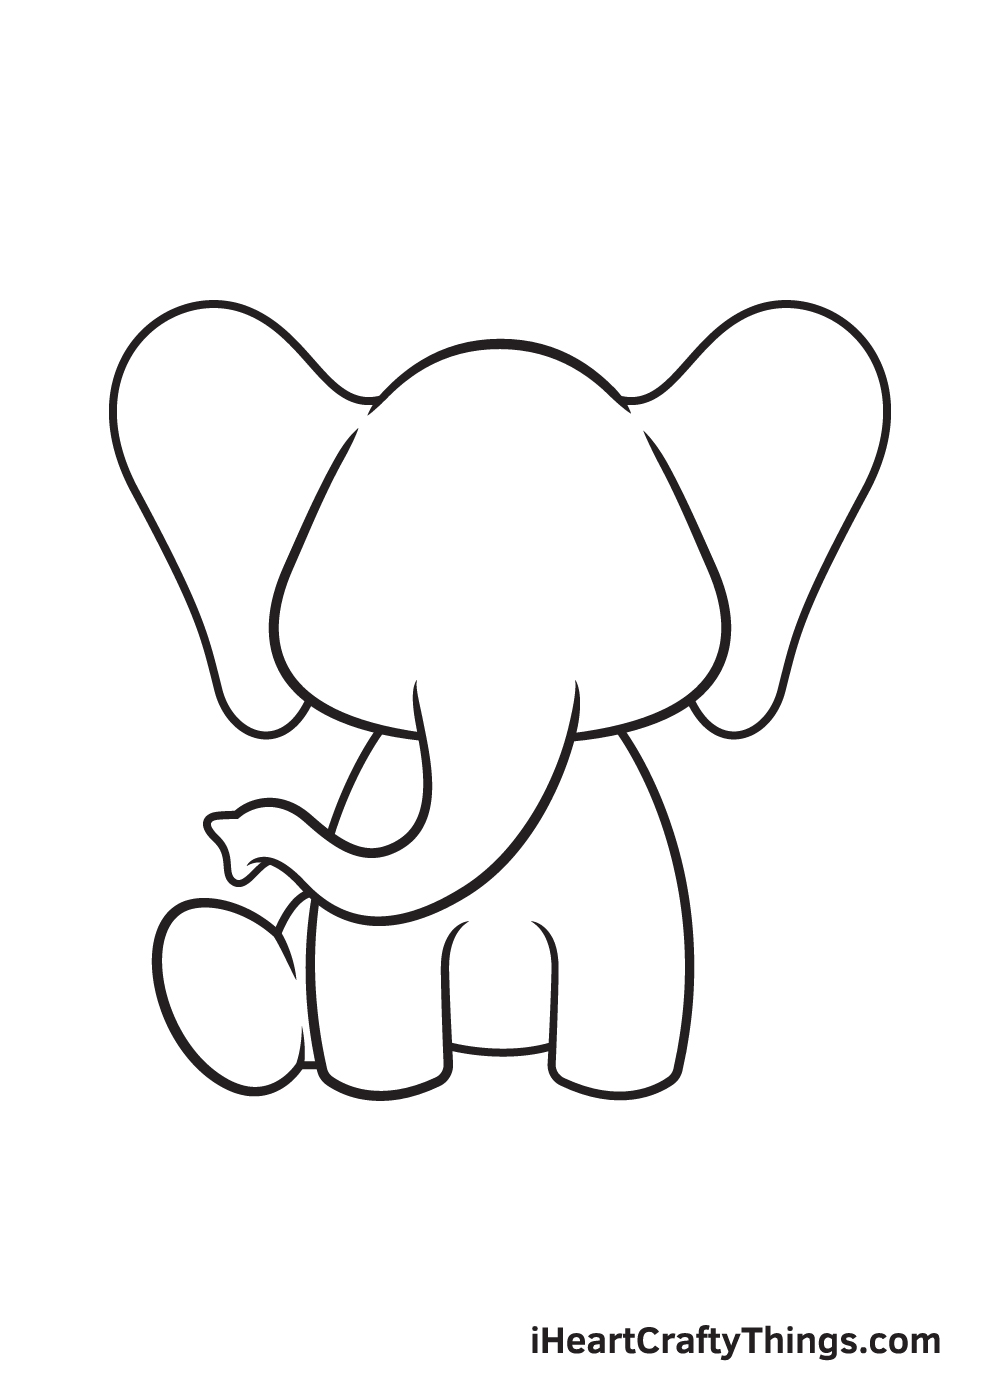 Vẽ con voi - Bước 6